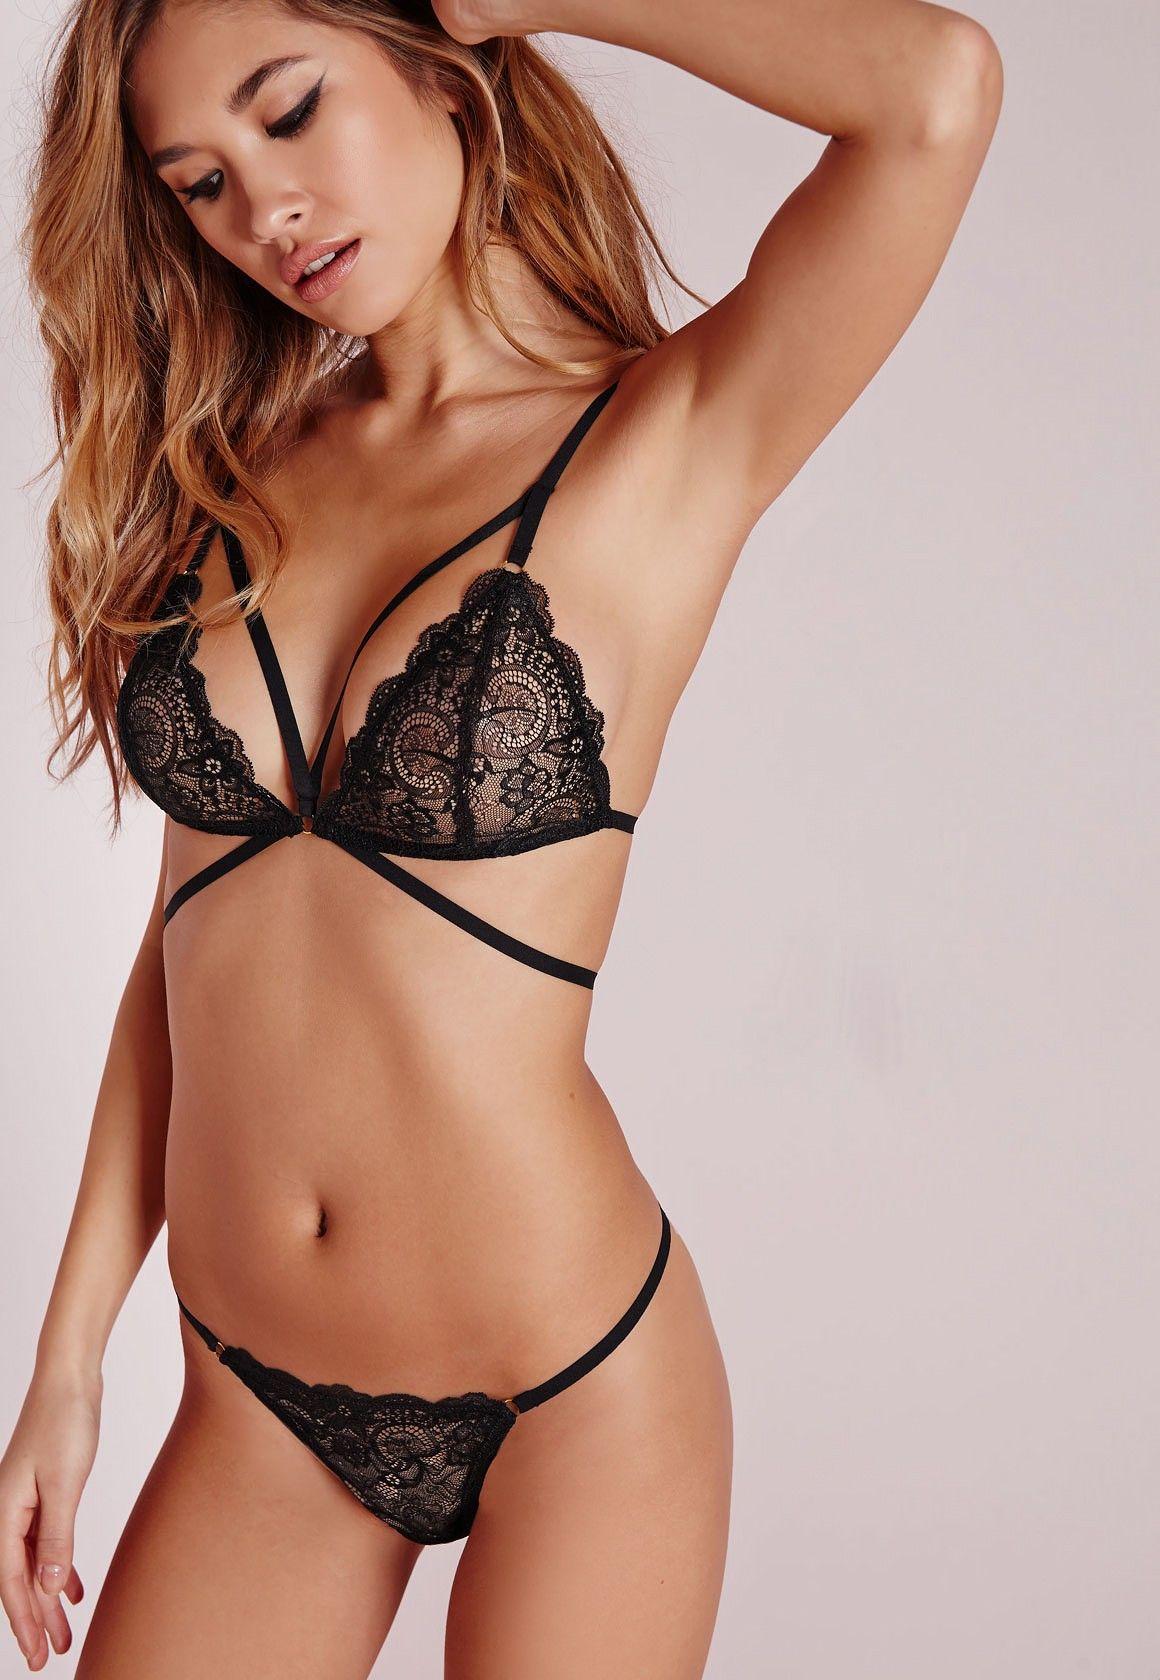 Dirty lingerie pics